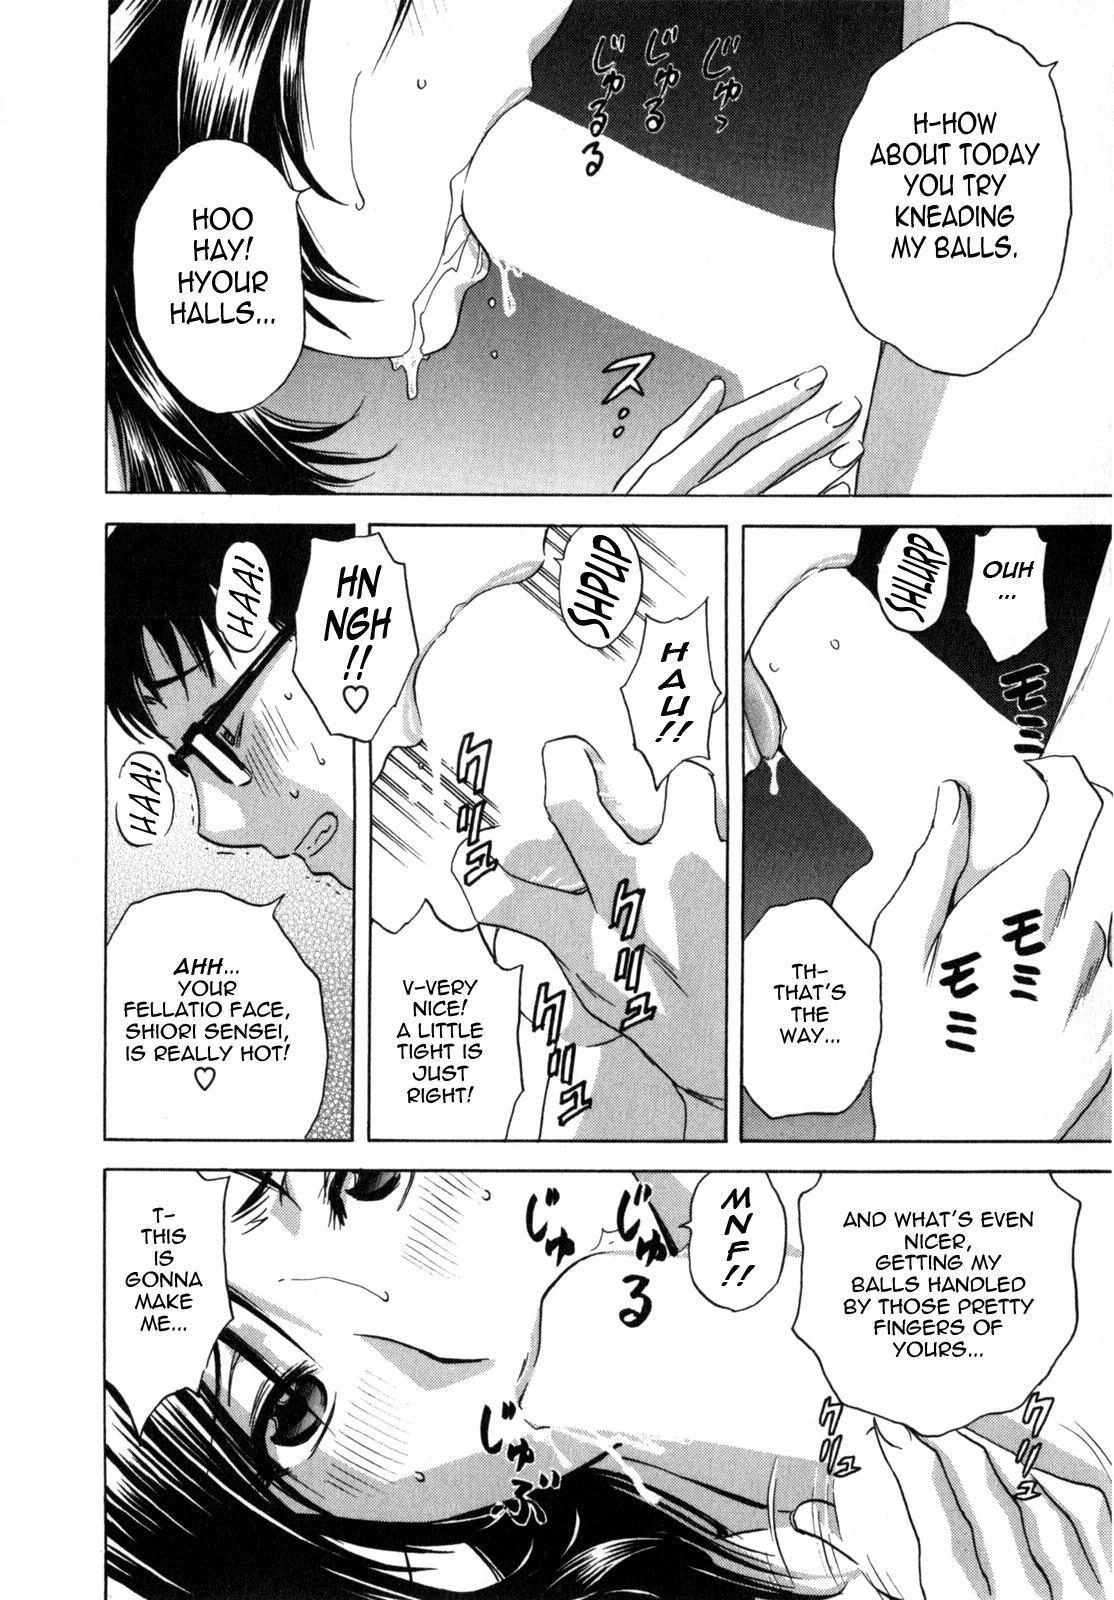 [Hidemaru] Life with Married Women Just Like a Manga 1 - Ch. 1-3 [English] {Tadanohito} 54